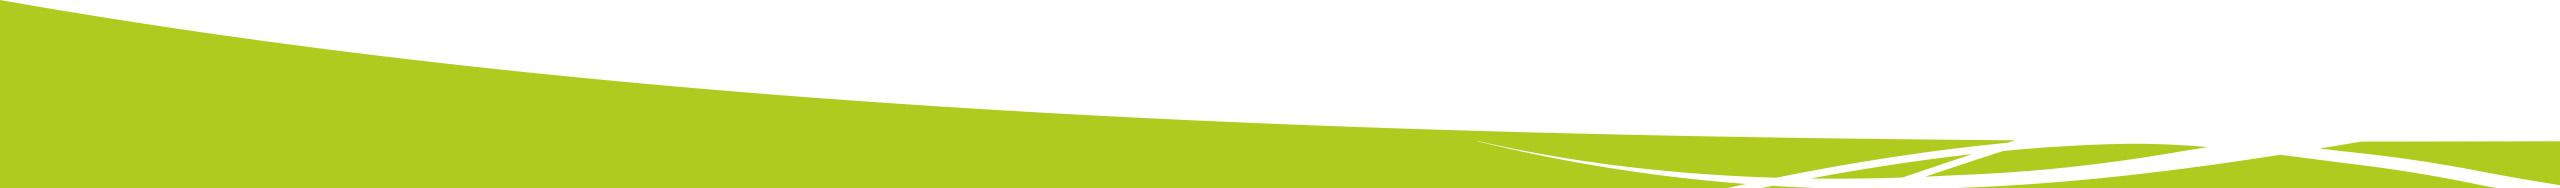 grand national du trot, 2017, hippodrome lisieux, loisirs, normandie